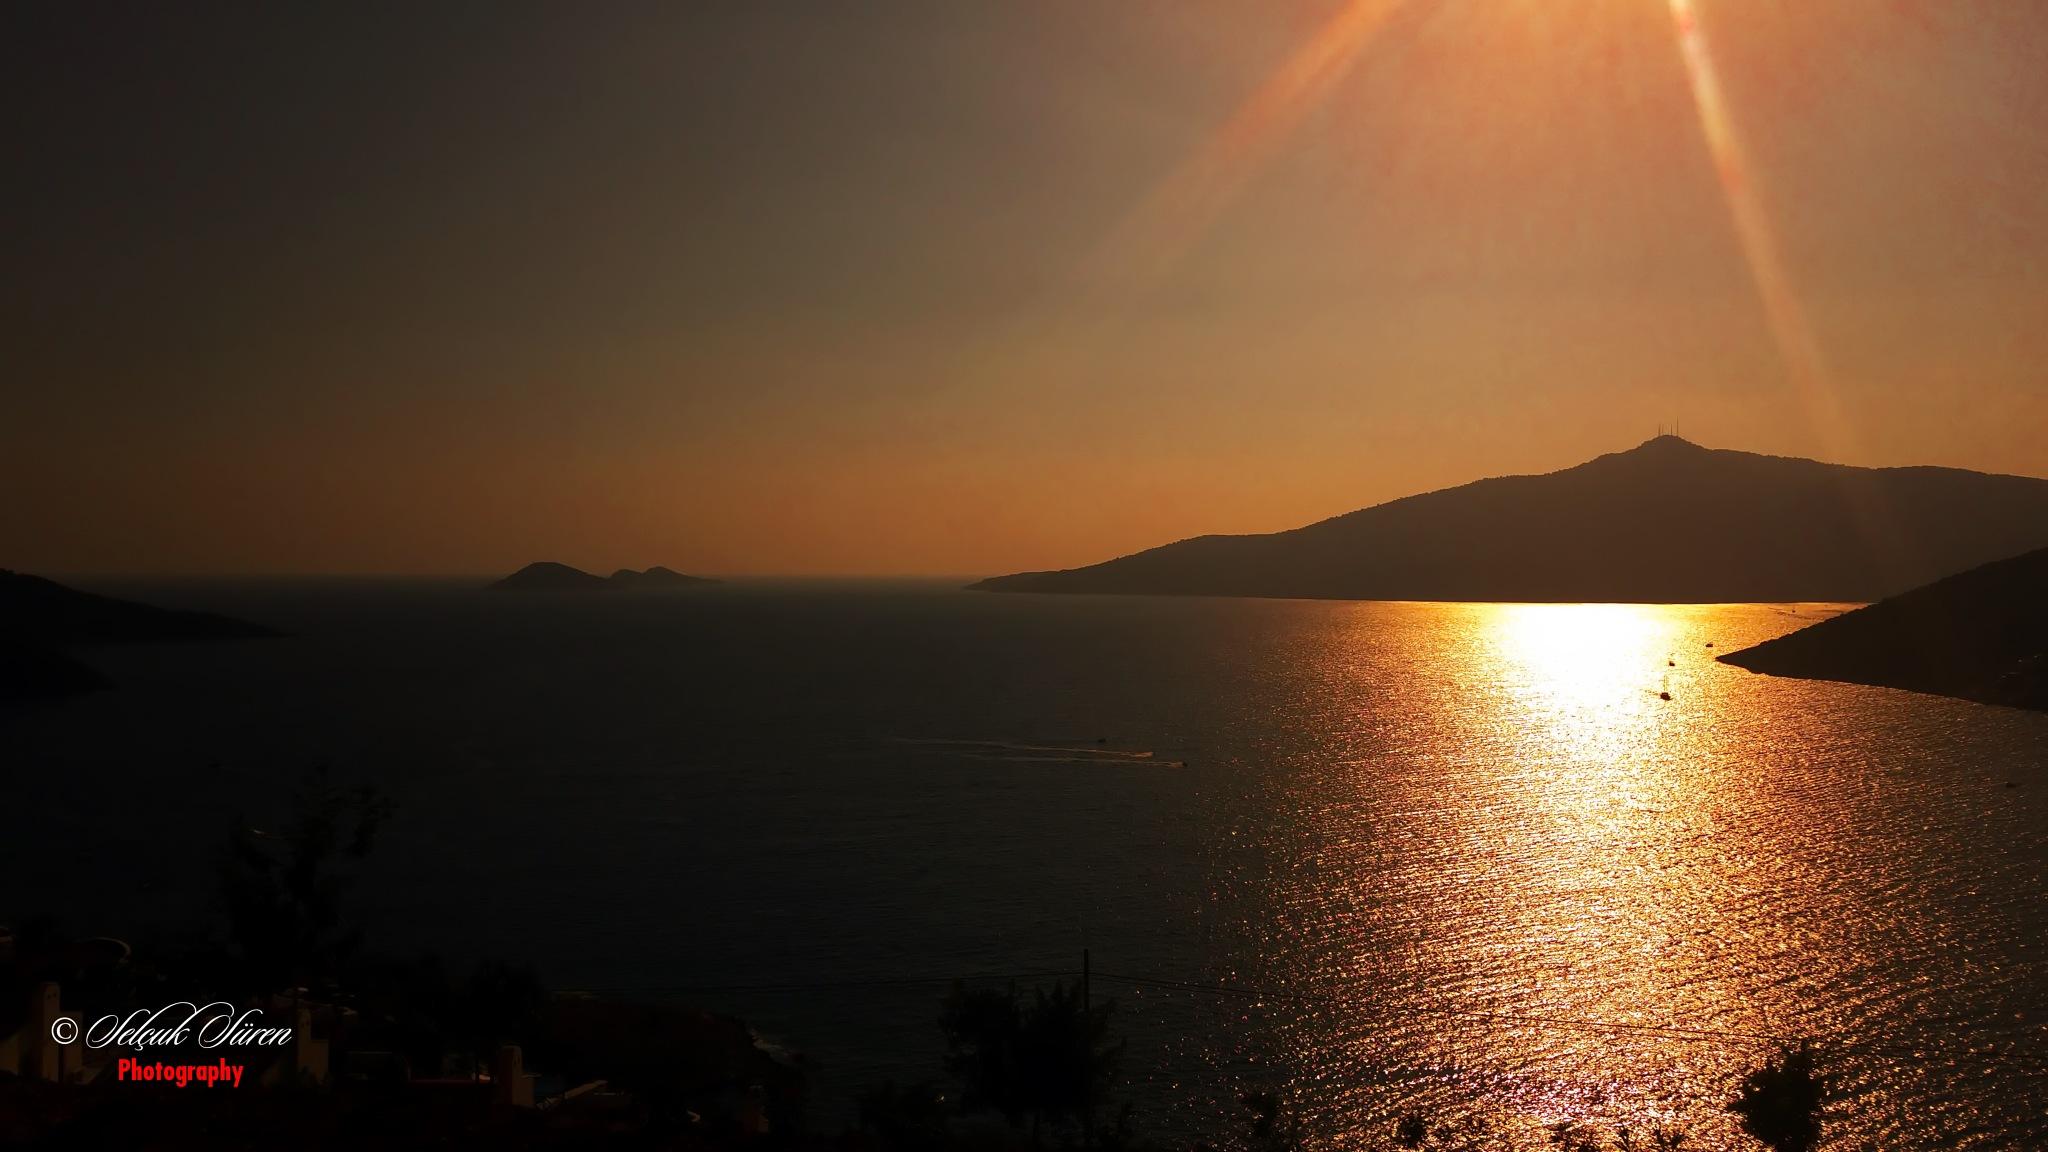 Sunset by Selcuk Suren